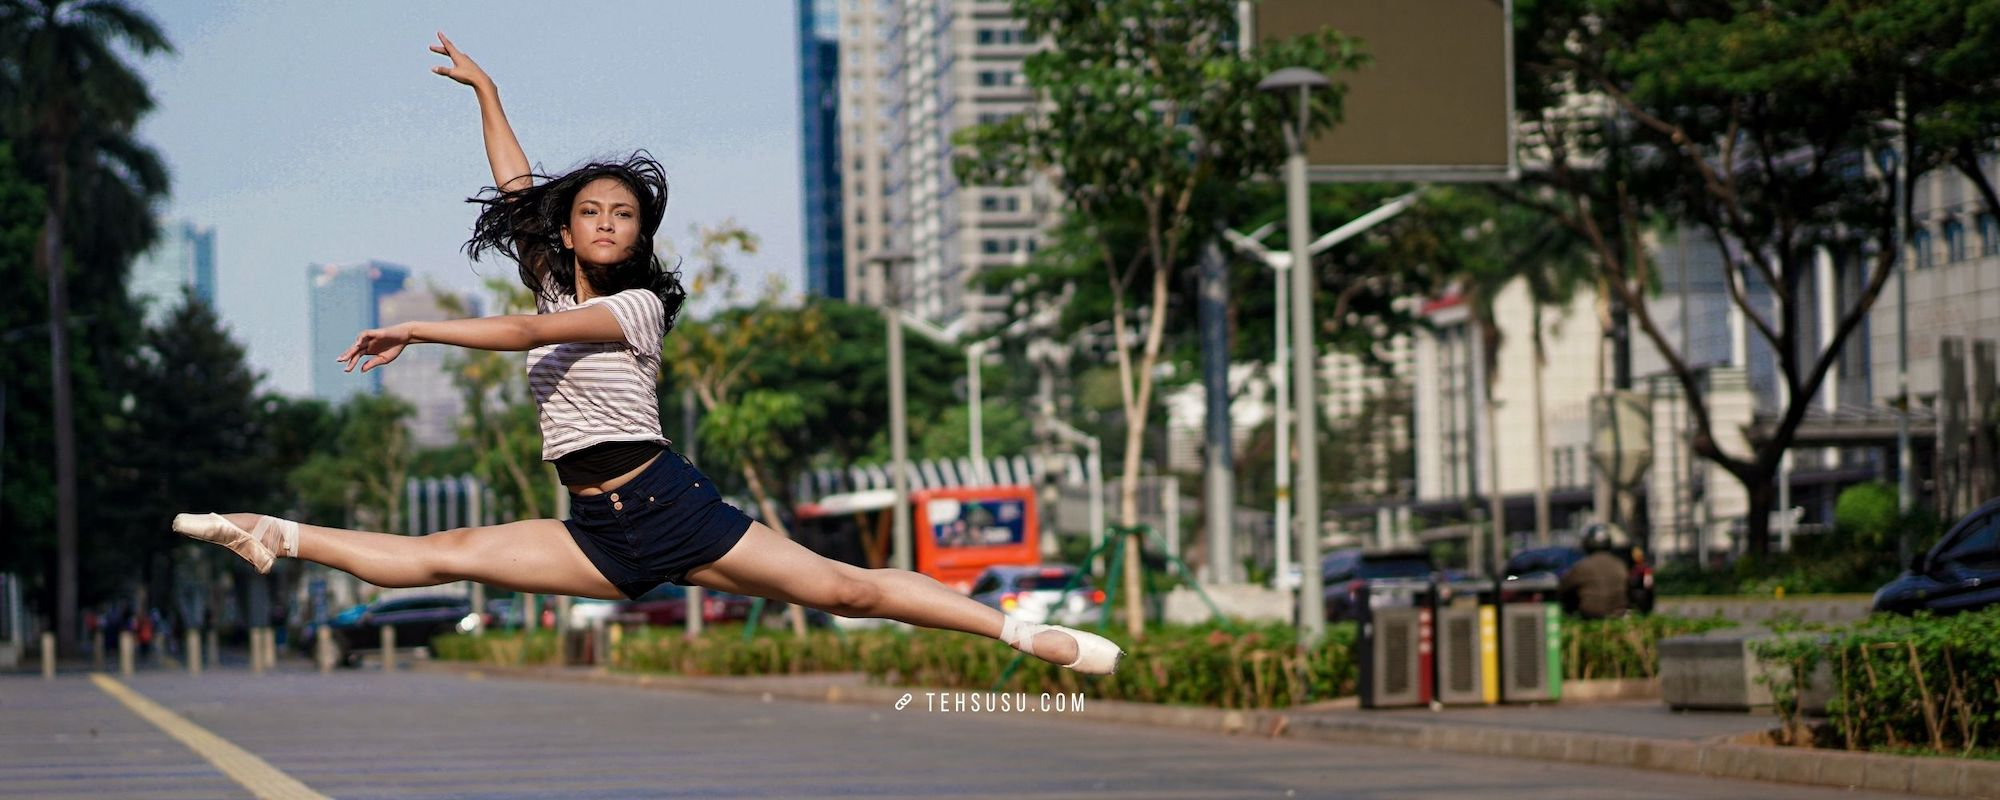 Jakarta Memang Hot, Tapi Masih Bisa Buat Motret Street Ballet Photography